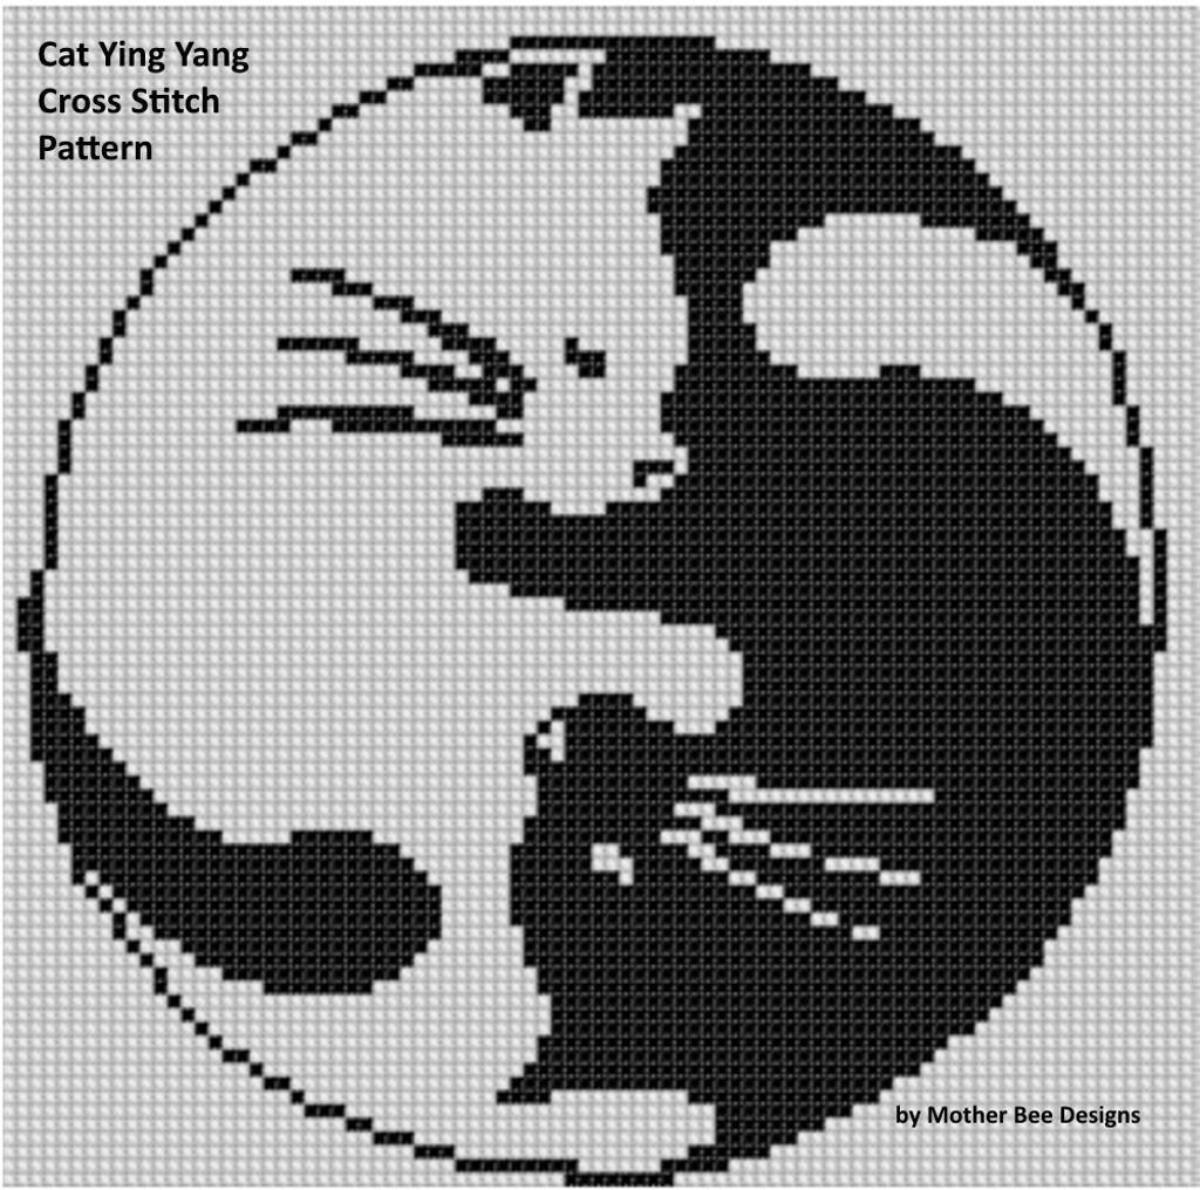 Cat Ying Yang Cross Stitch Pattern | تابلوهاي قلاب بافي | Pinterest ...